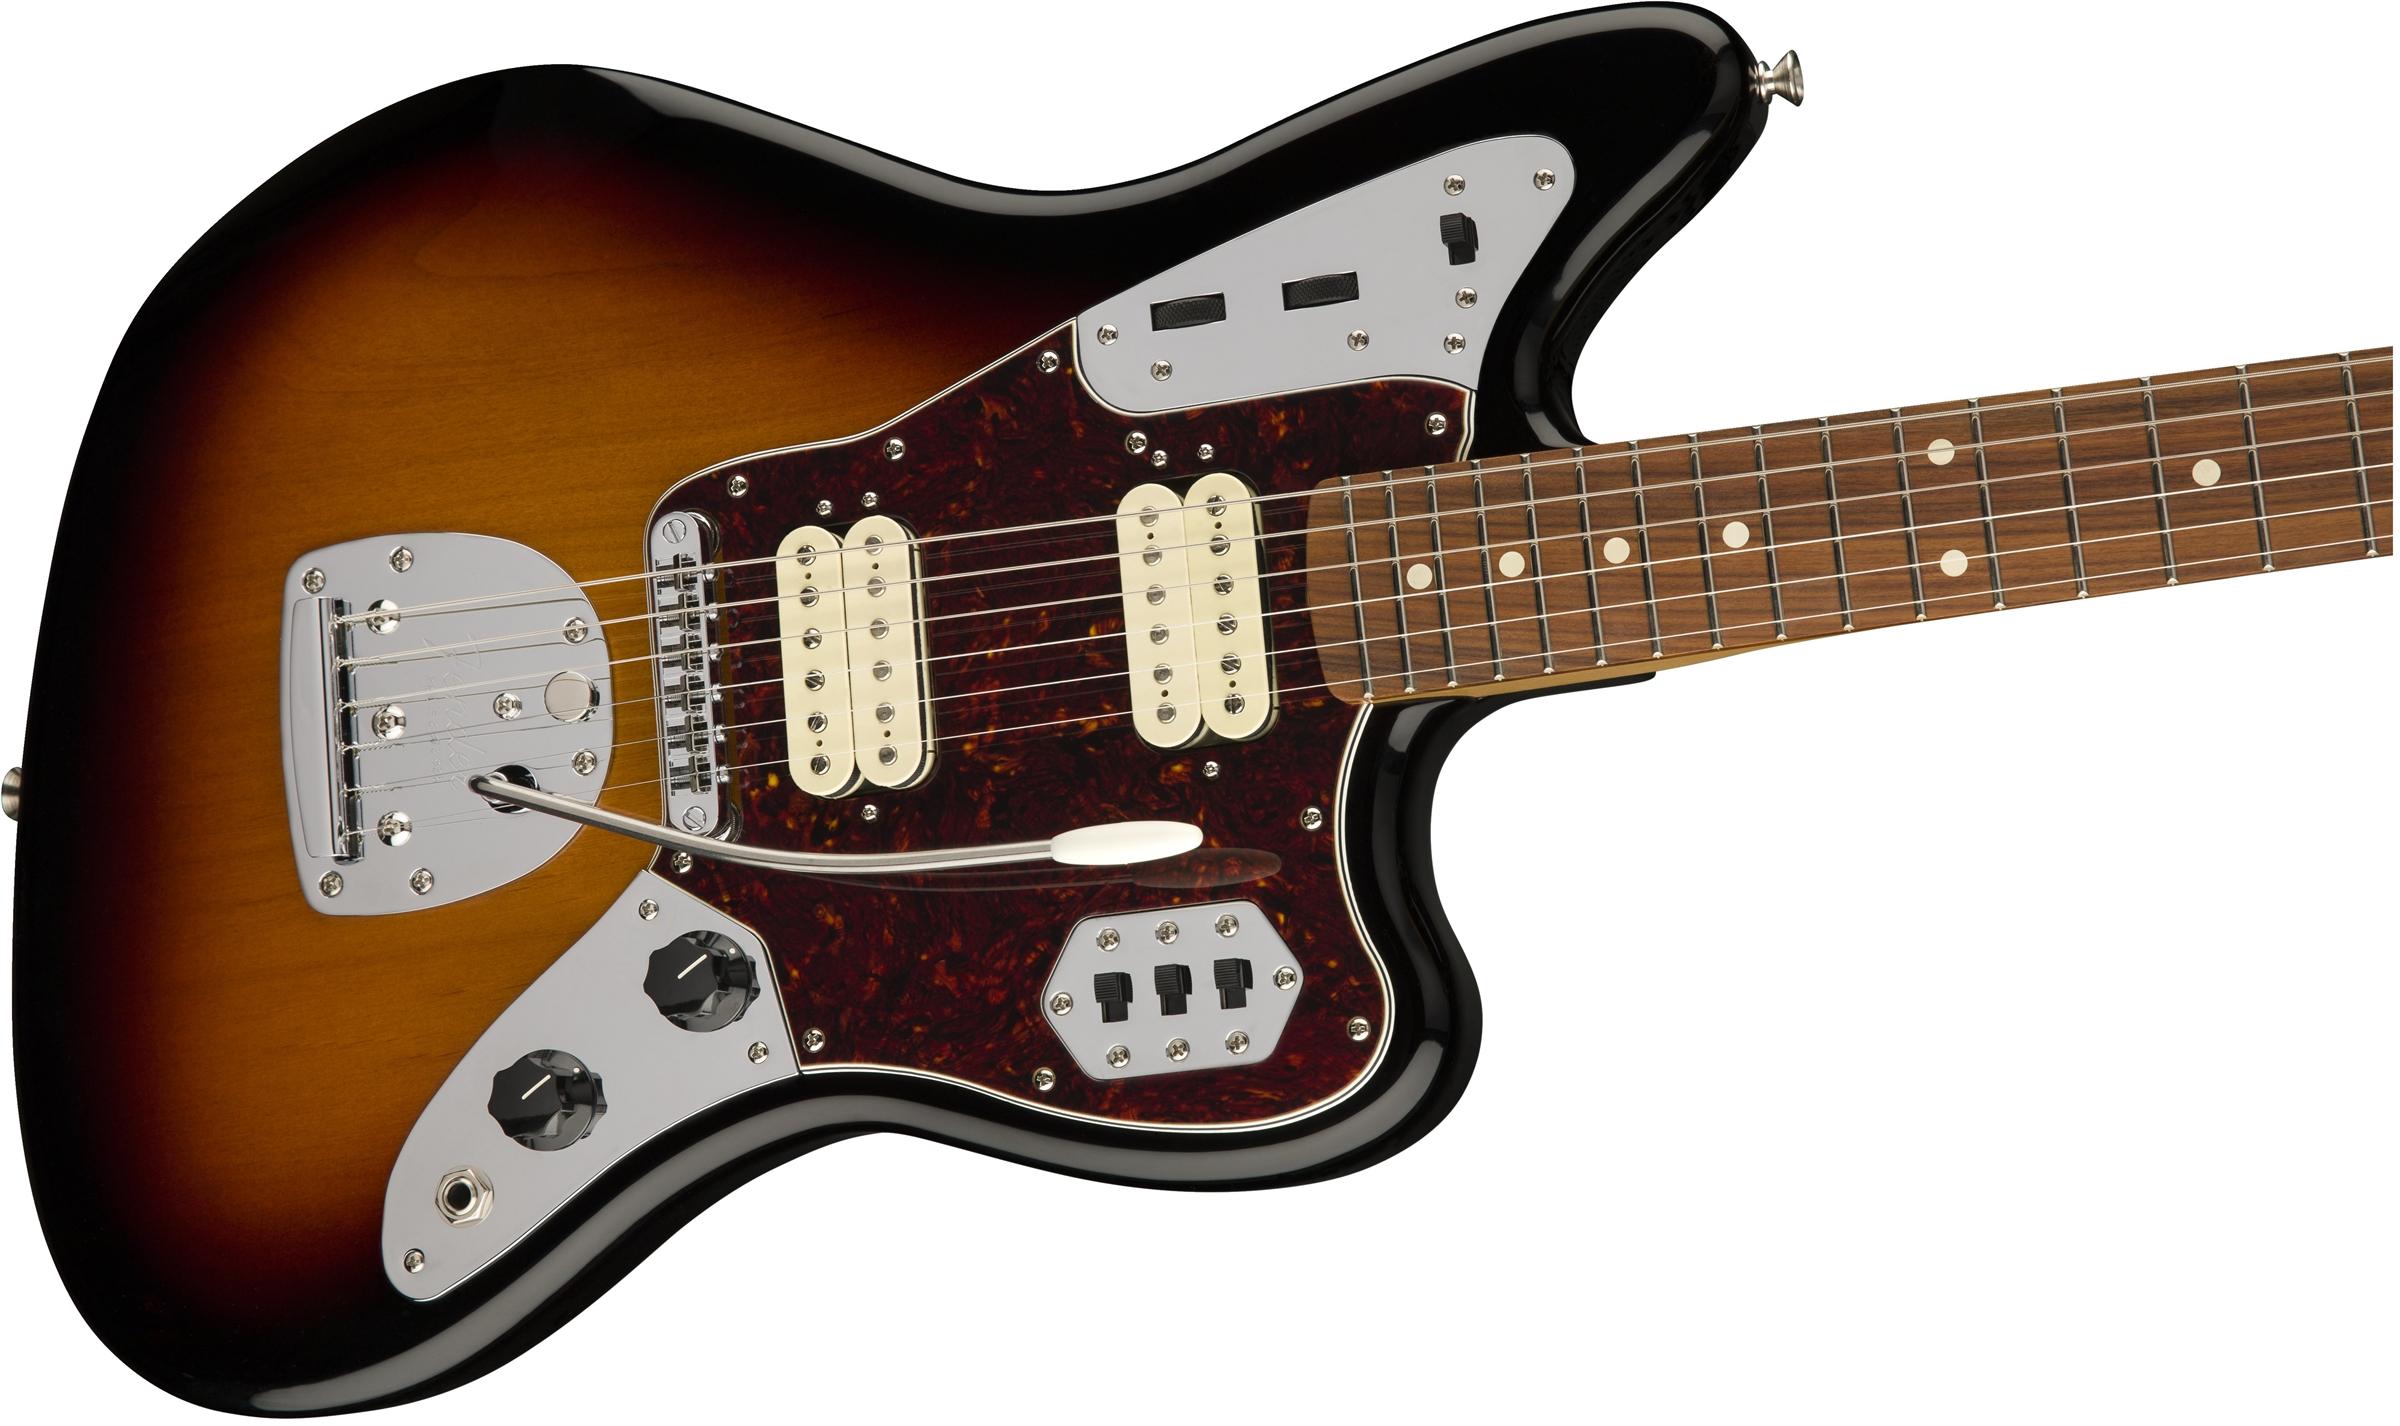 Fender Player Jaguar Hh Wiring Schematics Reinvent Your Jazzmaster Diagram 50 S Solutions Rh Rausco Com Classic